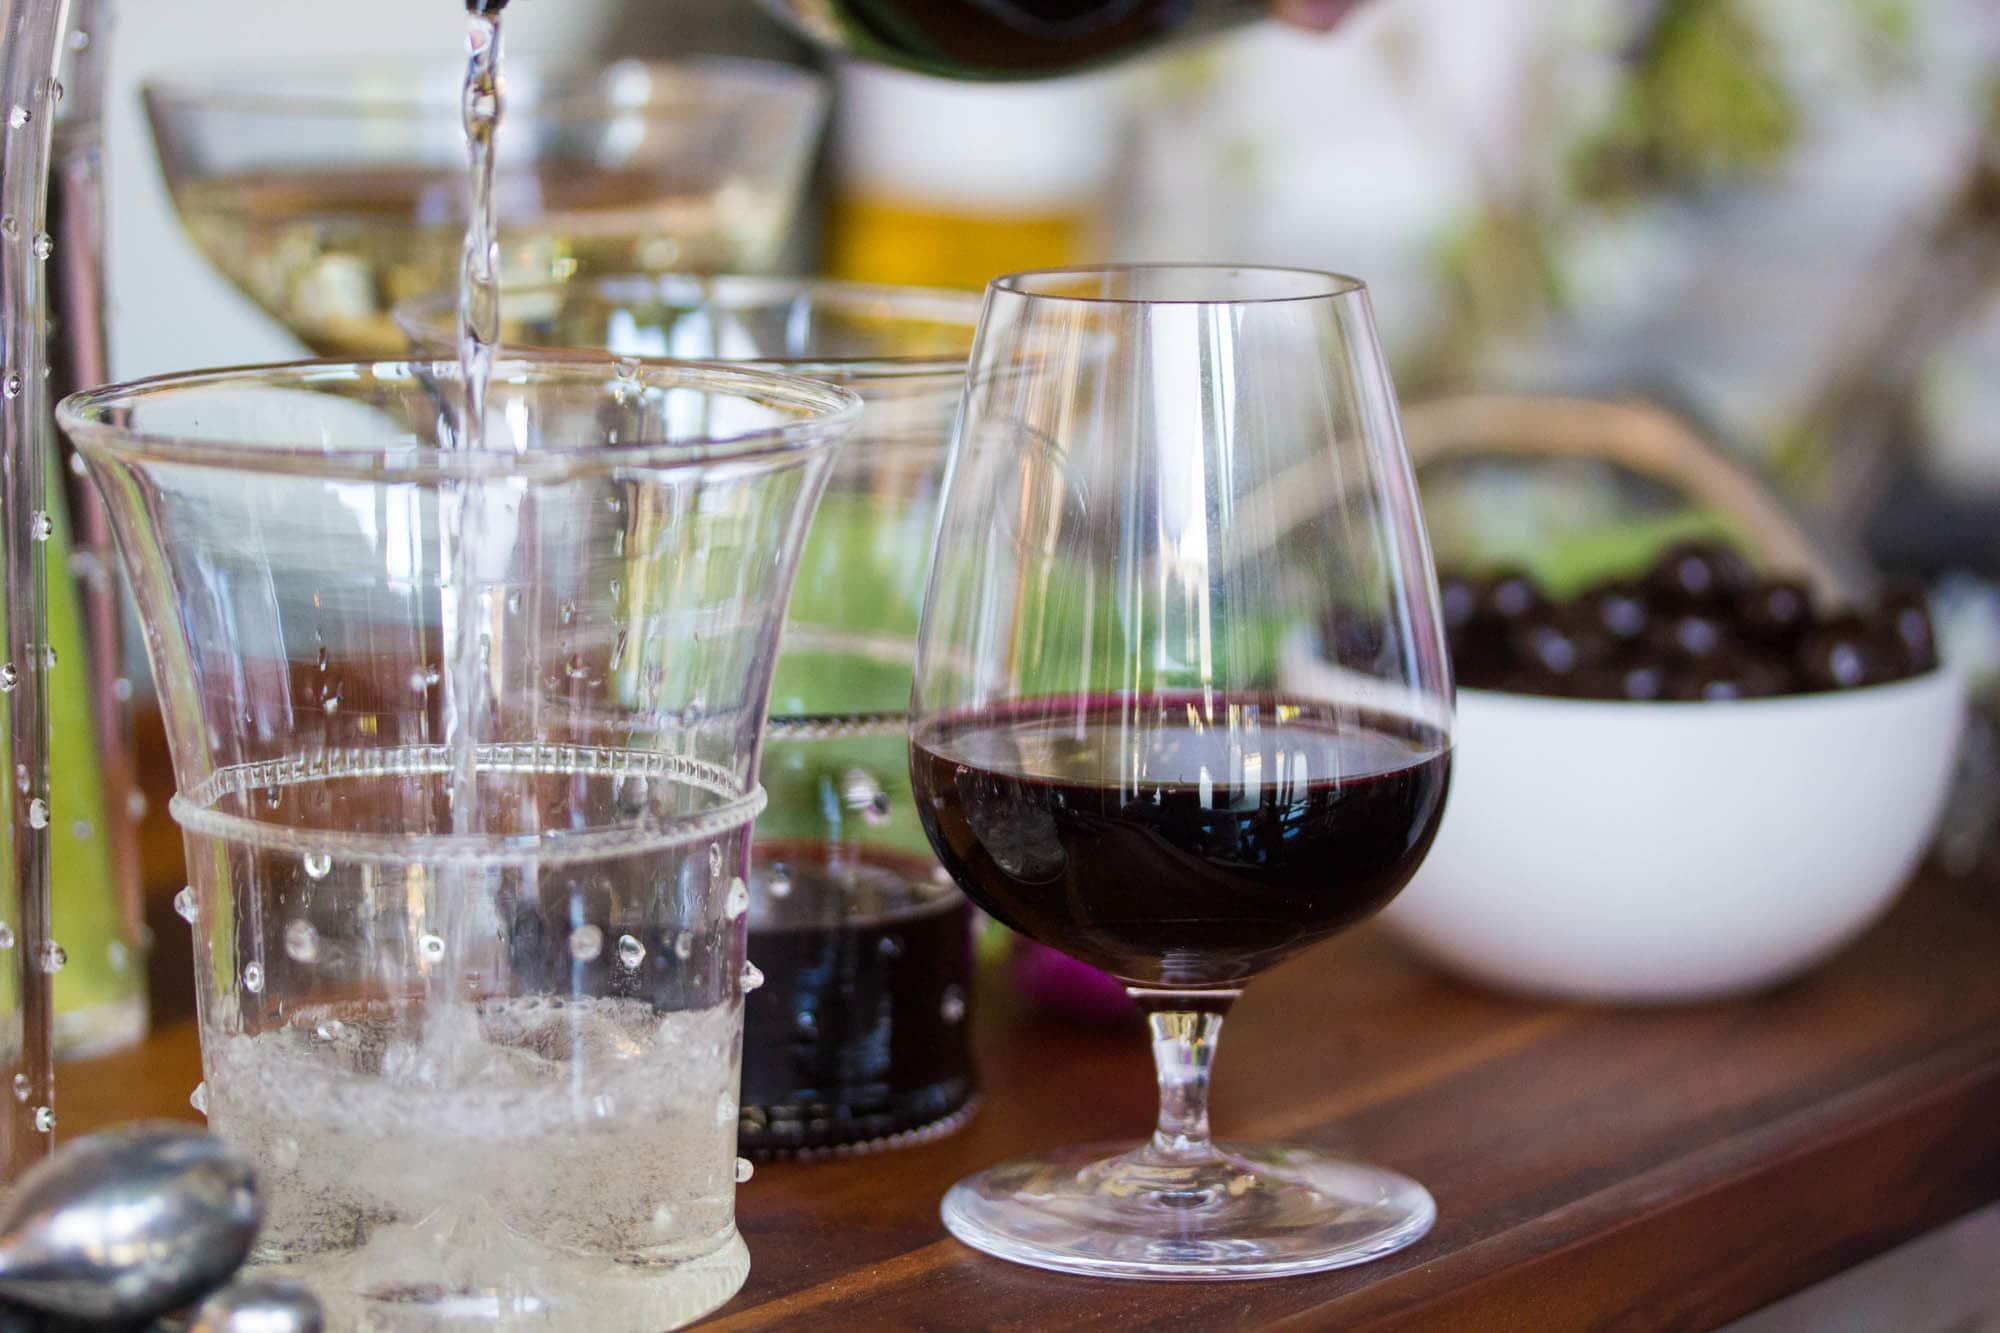 Entertaining Idea: Do-It-Yourself Sweet & Savory Crostini Bar